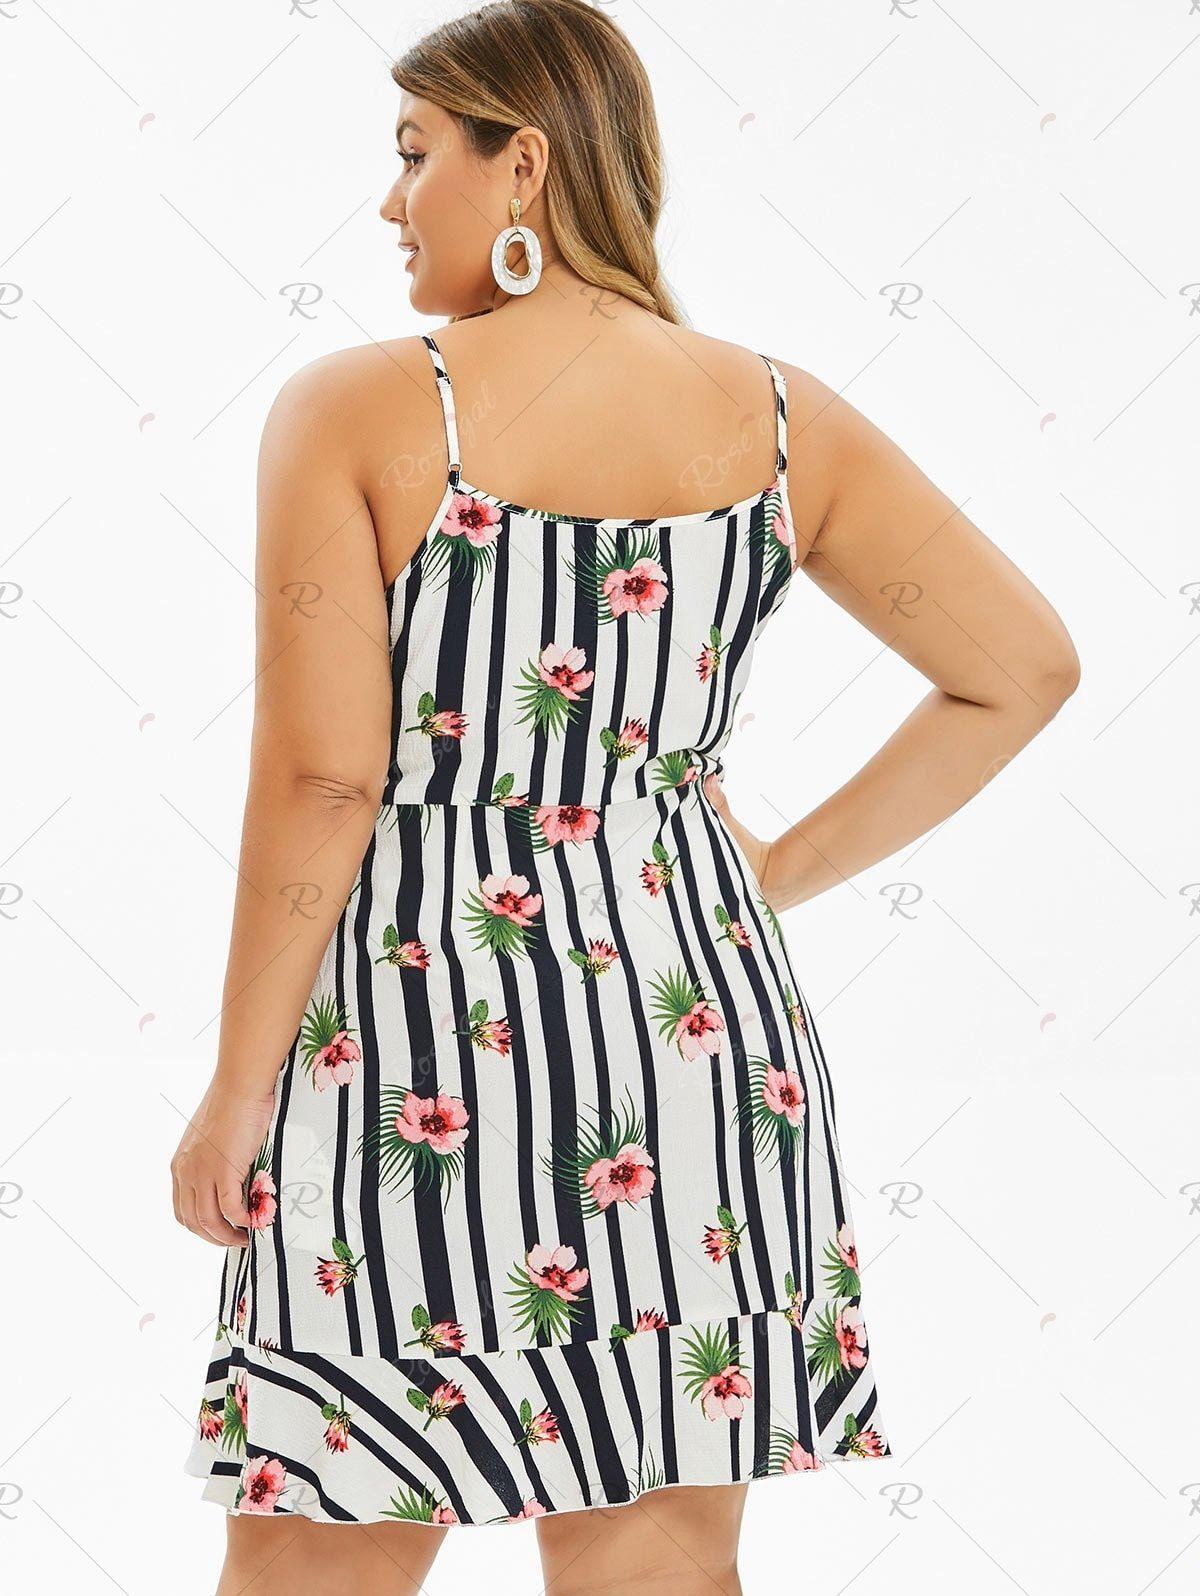 Plus Size Floral Print Ruffle Cami Dress Ruffle Cami Dress Striped Mini Dress Cami Dress [ 1596 x 1200 Pixel ]